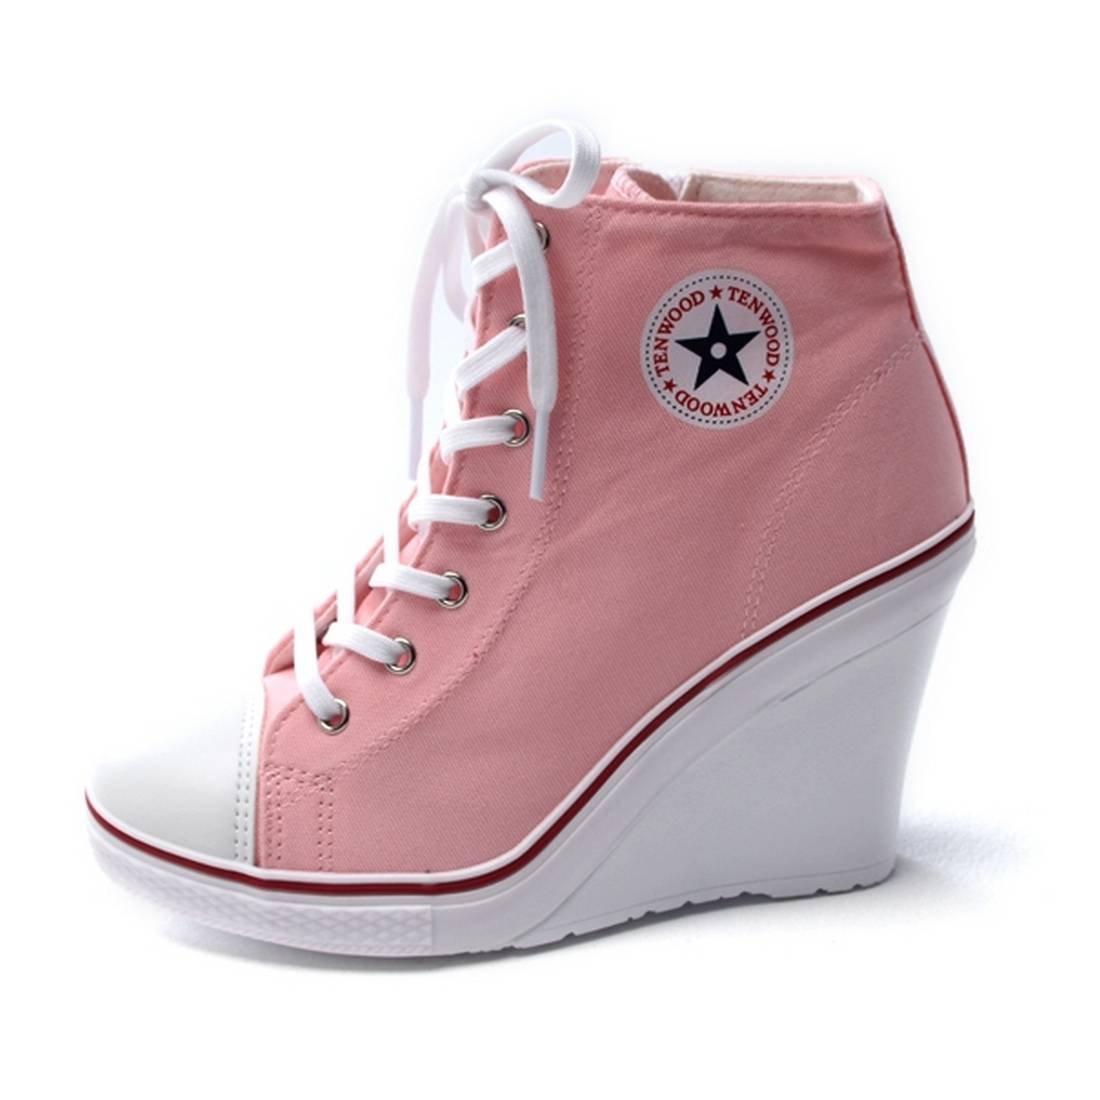 9b22996e3c6 EpicStep Women s High Top Wedges High Heels Fashion Sneakers Pink 8 M US   Amazon.ca  Shoes   Handbags